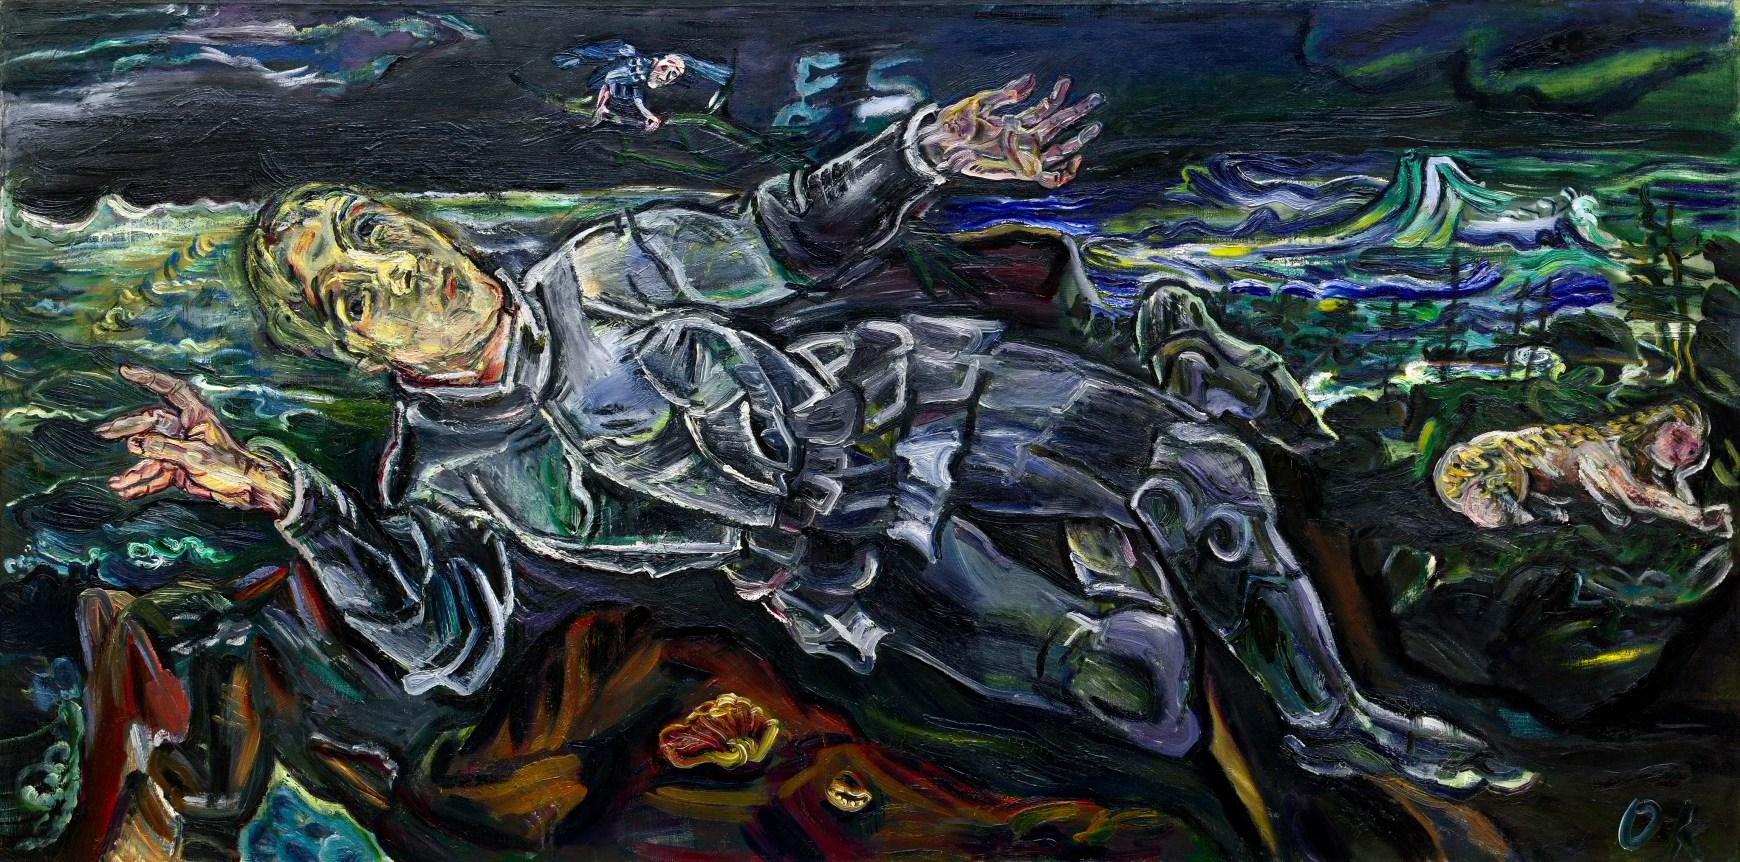 Oscar Kokoschka,  Knight Errant  (1915) Oil on canvas, 35 1/4 x 70 7/8 inches (89.5 x 180 cm) Image source: 'Knight Errant', Guggenheim,  https://www.guggenheim.org/artwork/2224